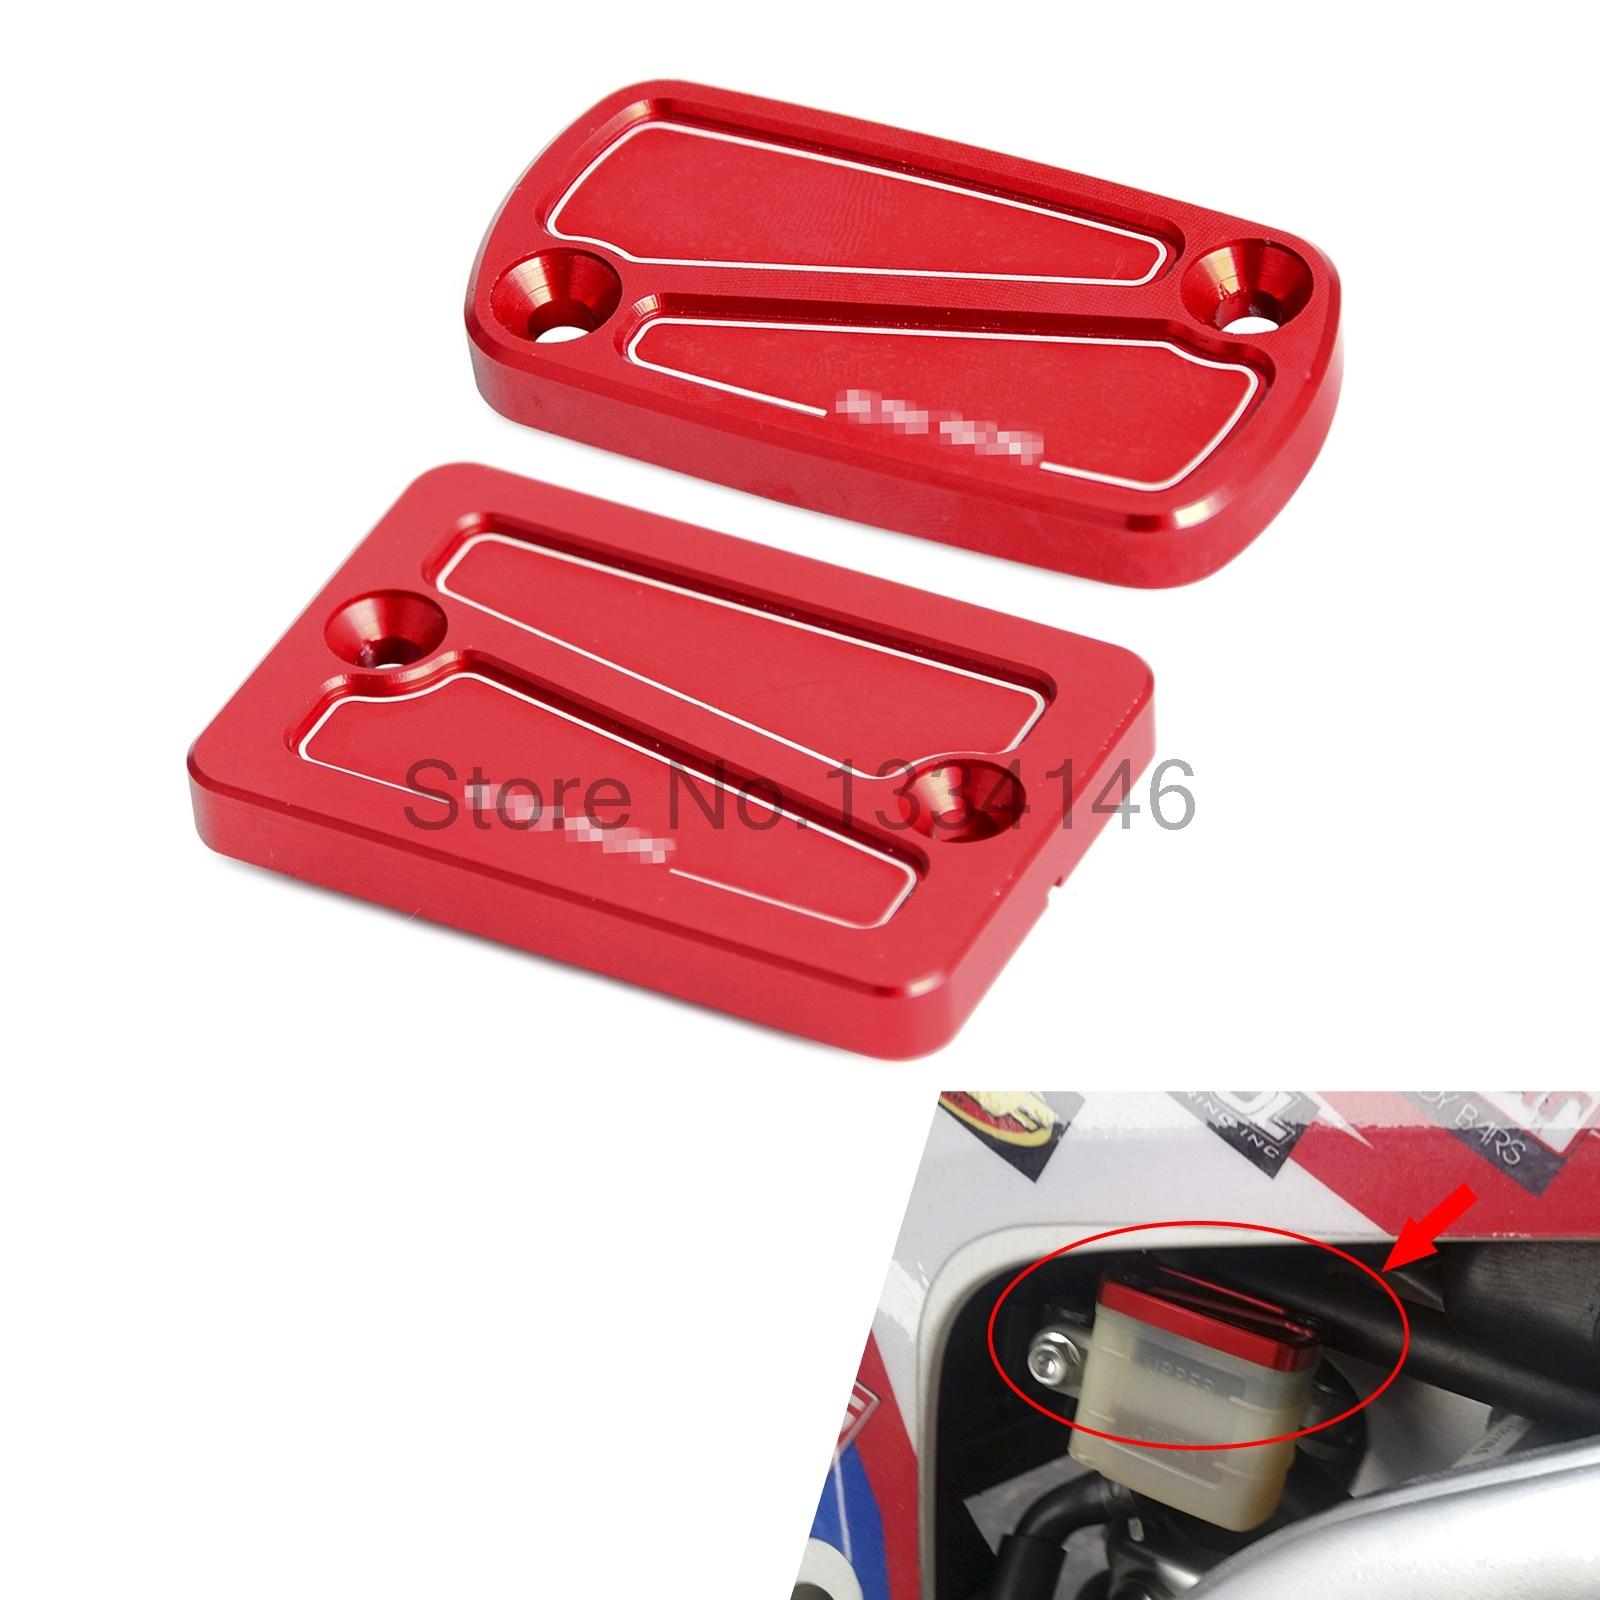 CNC Front & Rear Brake Reservoir Fluid Cover Cap For Honda CRF250L CRF250M 2012-2015 2013 2014 15 Motocross Supermoto Dirt Bike